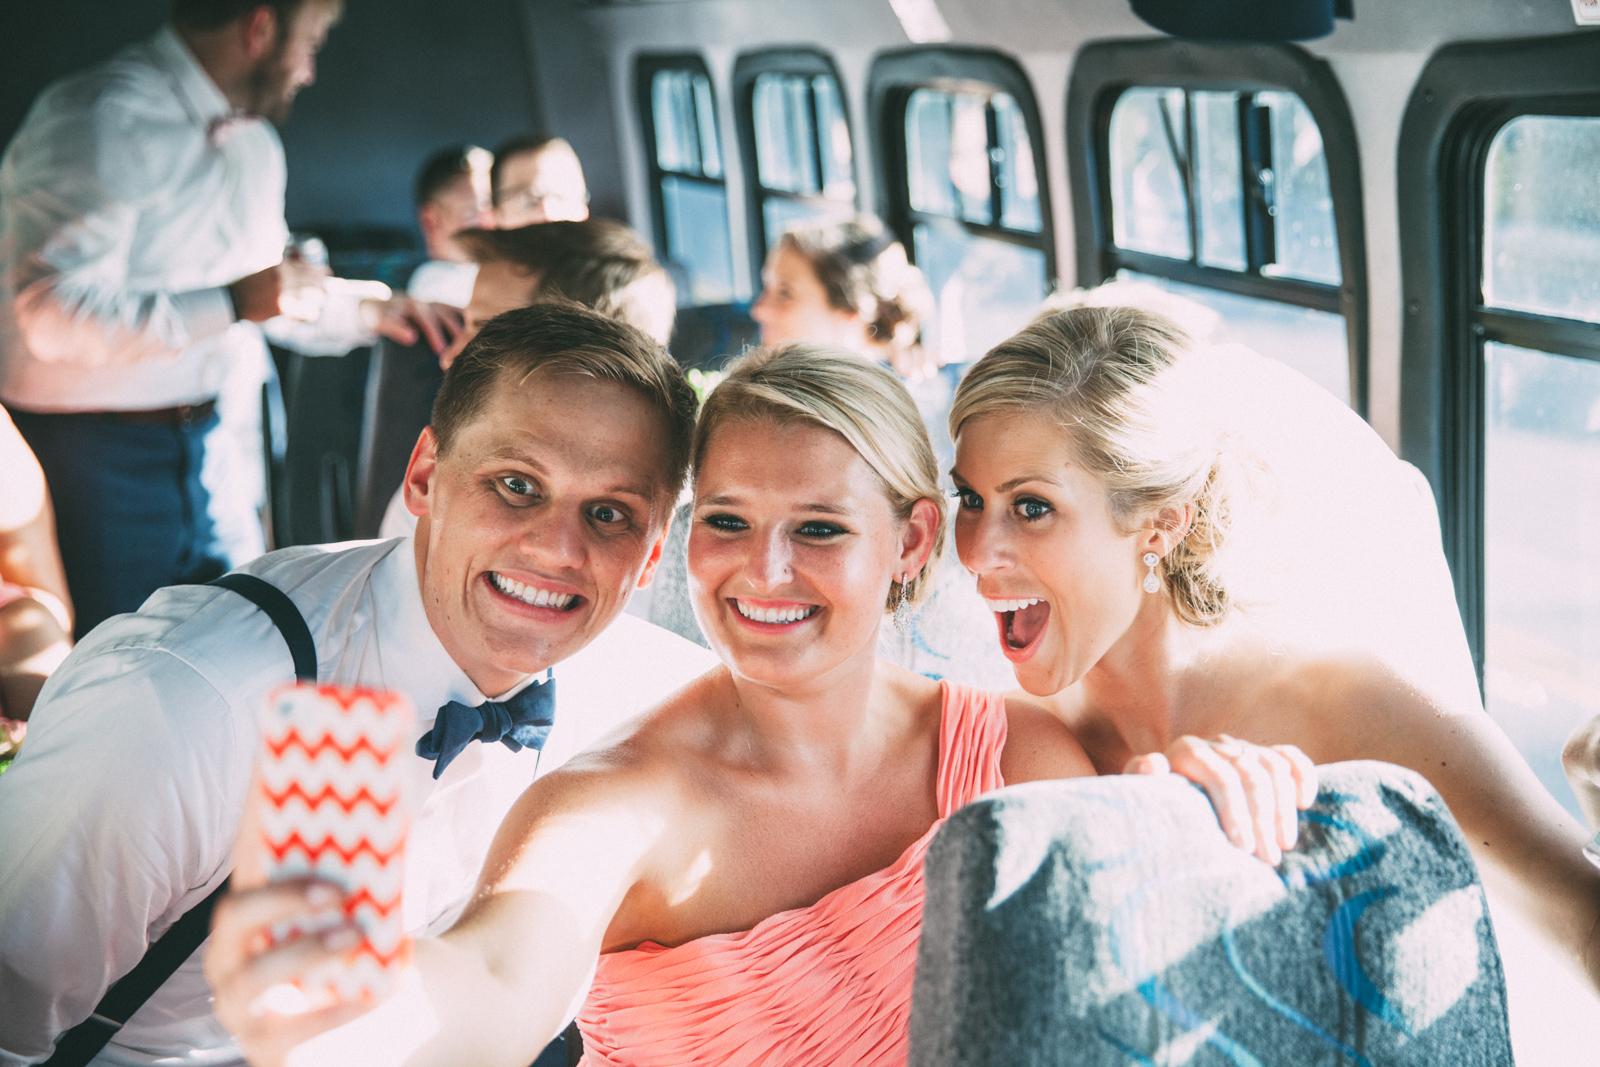 Bride and groom selfie with bridesmaid